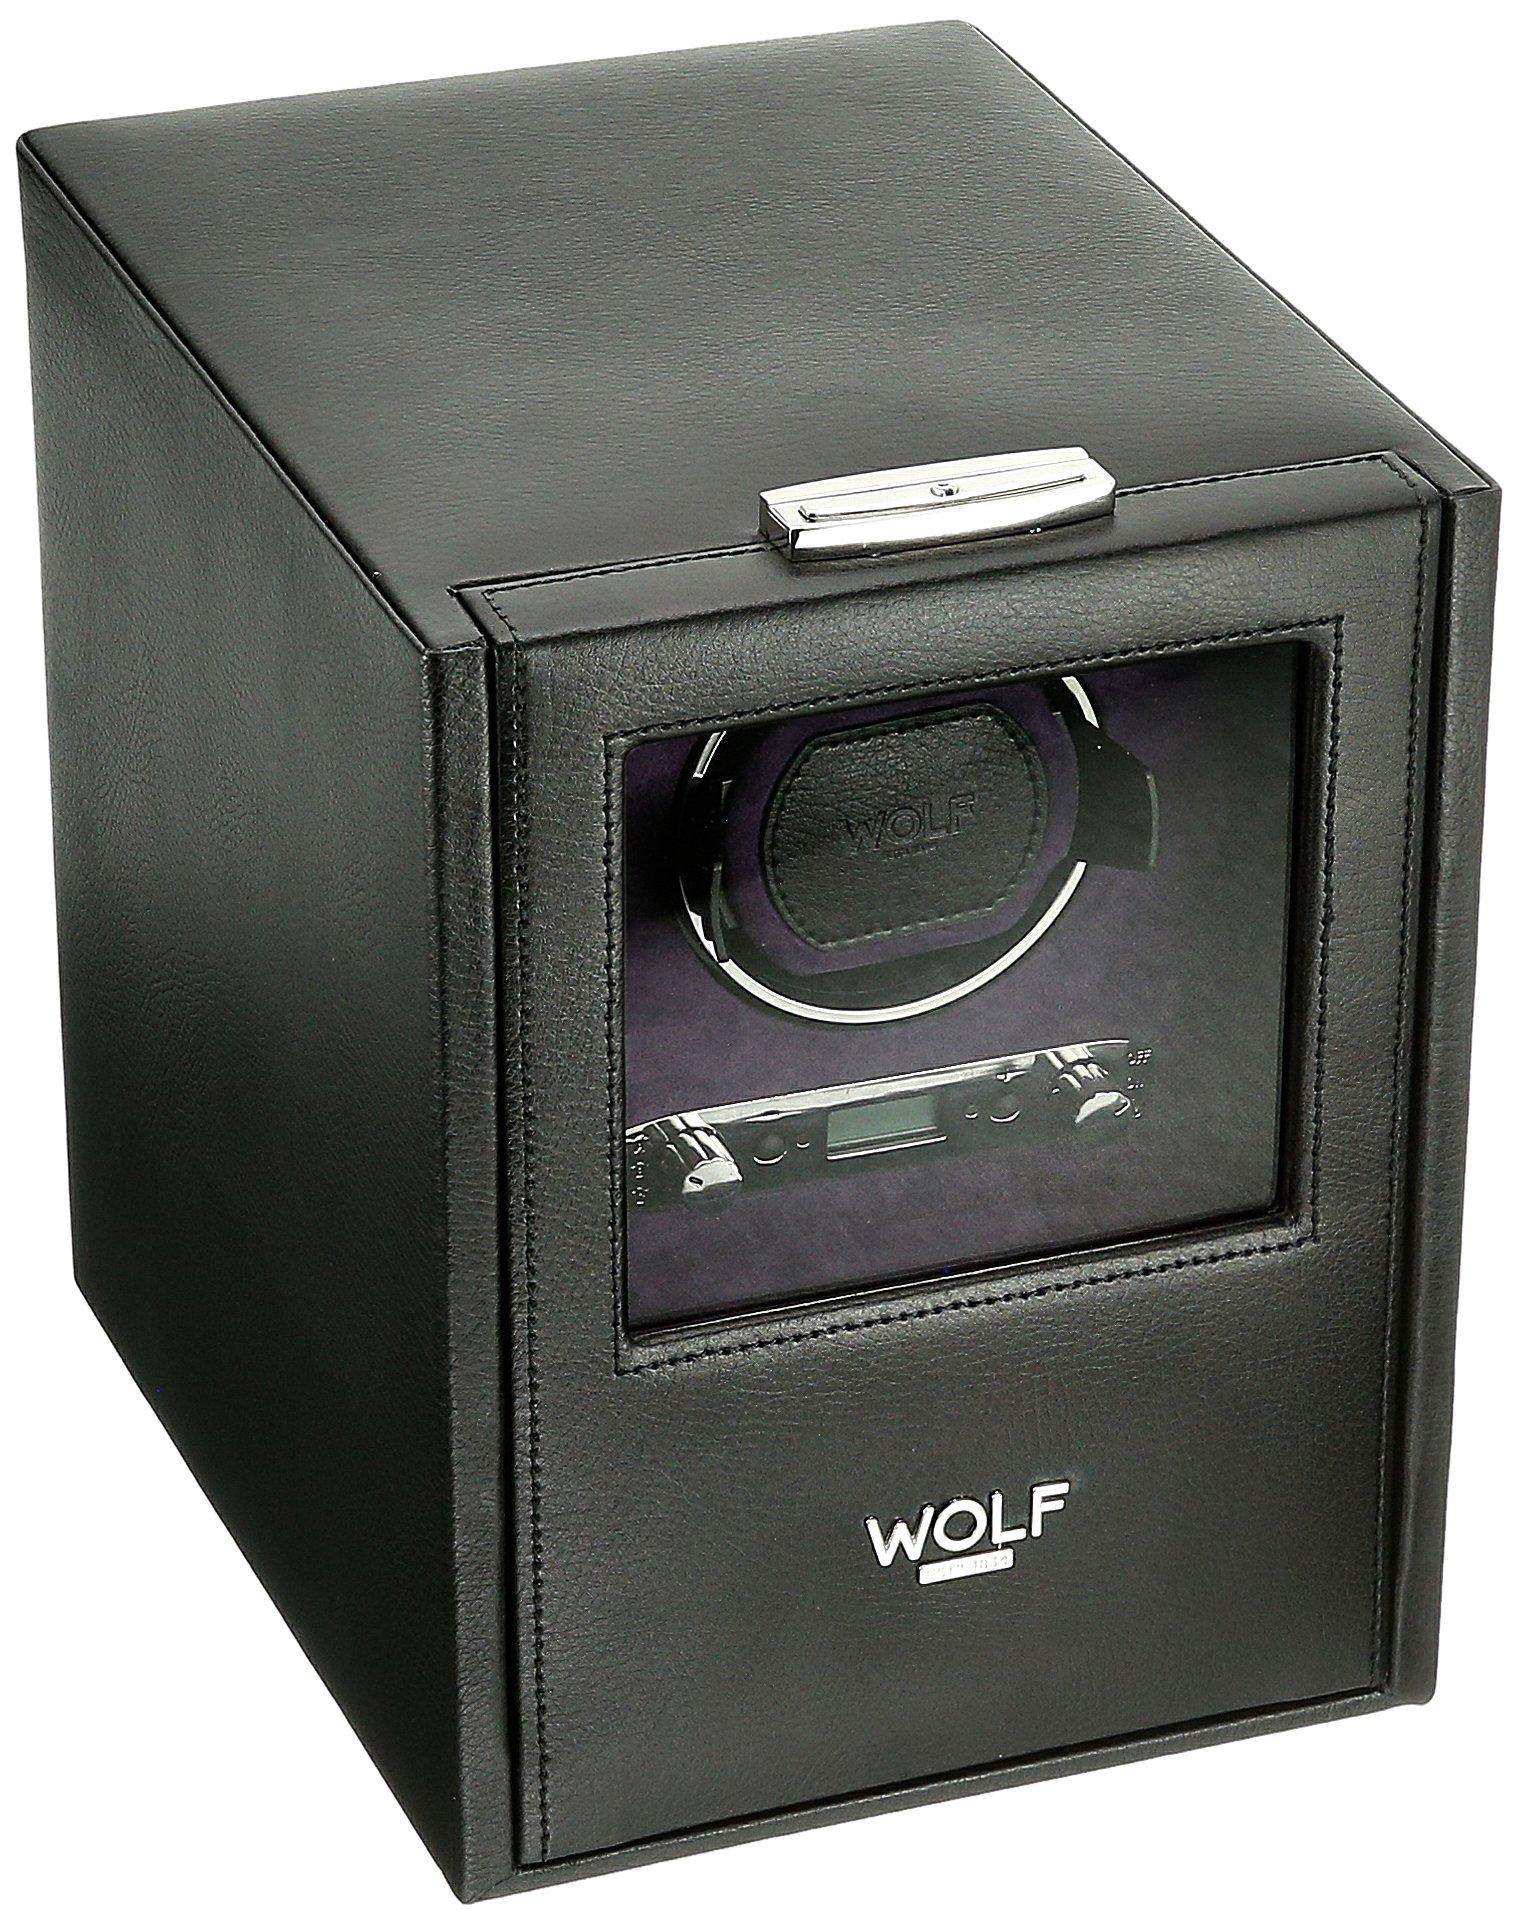 WOLF 460628 Blake Single Watch Winder with Storage, Black Pebble by WOLF